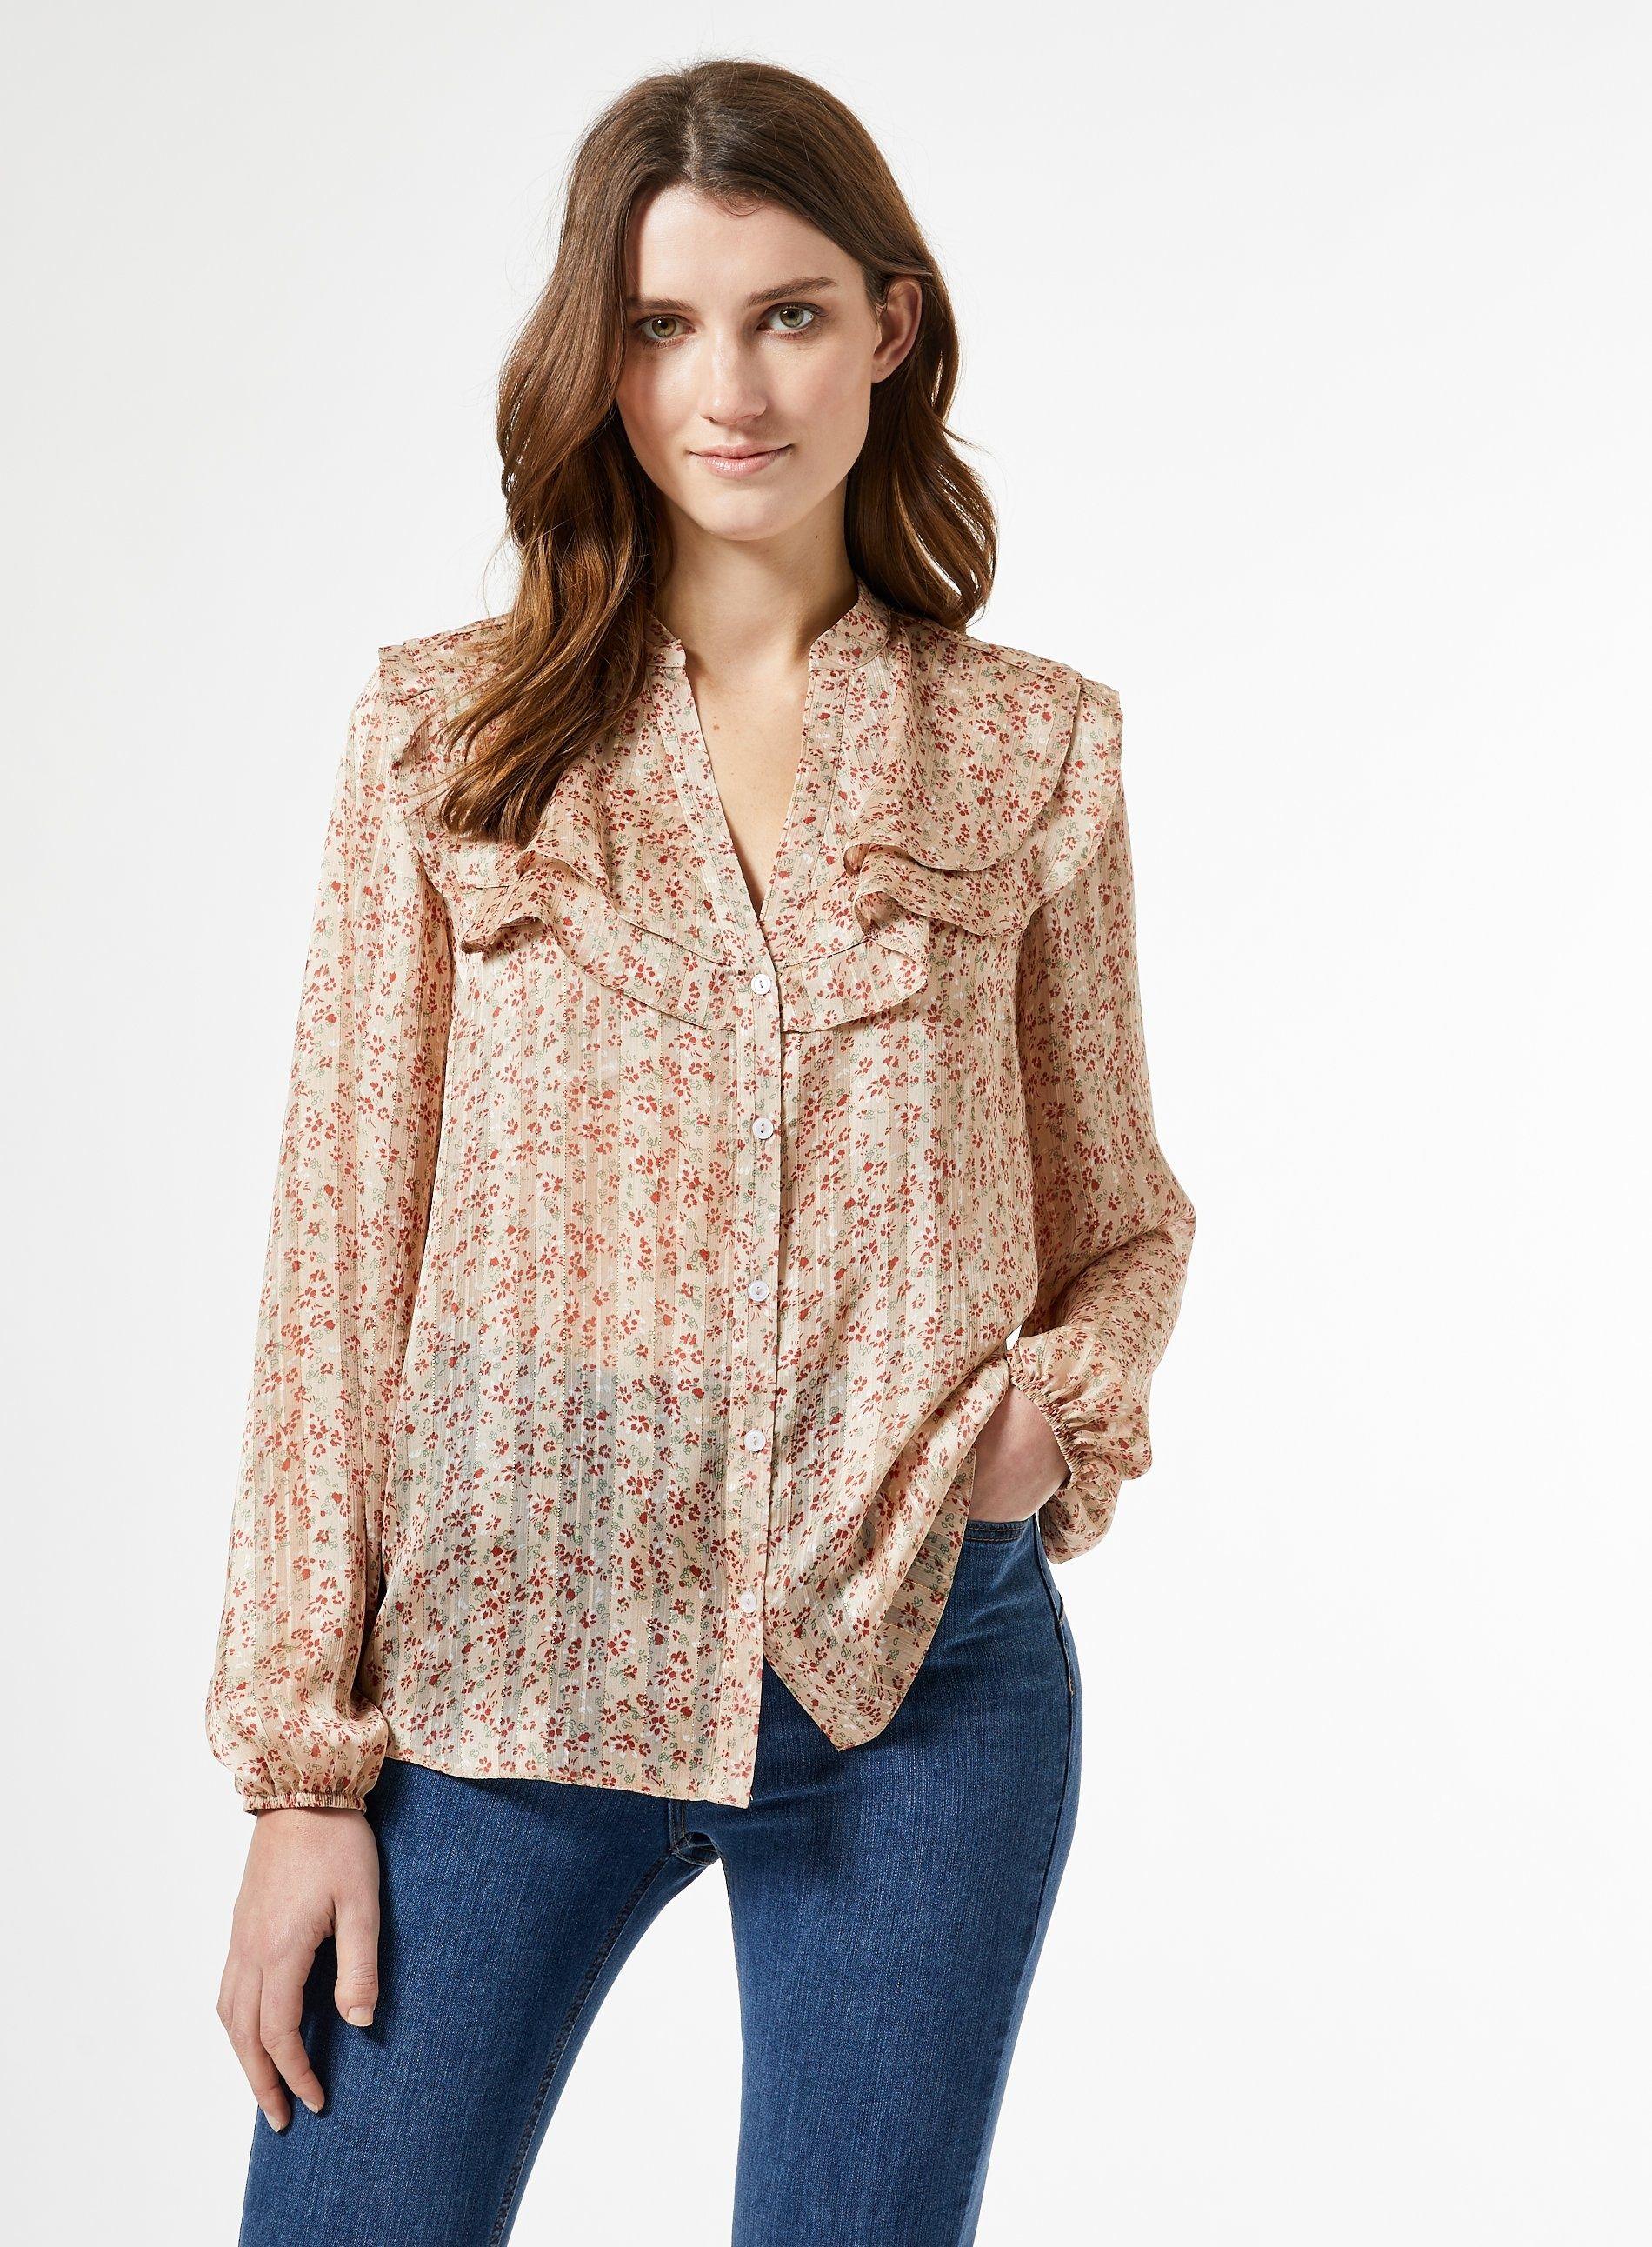 Dorothy Perkins Womens Pink Chiffon Floral Print Long Sleeve Shirt V-Neck Top